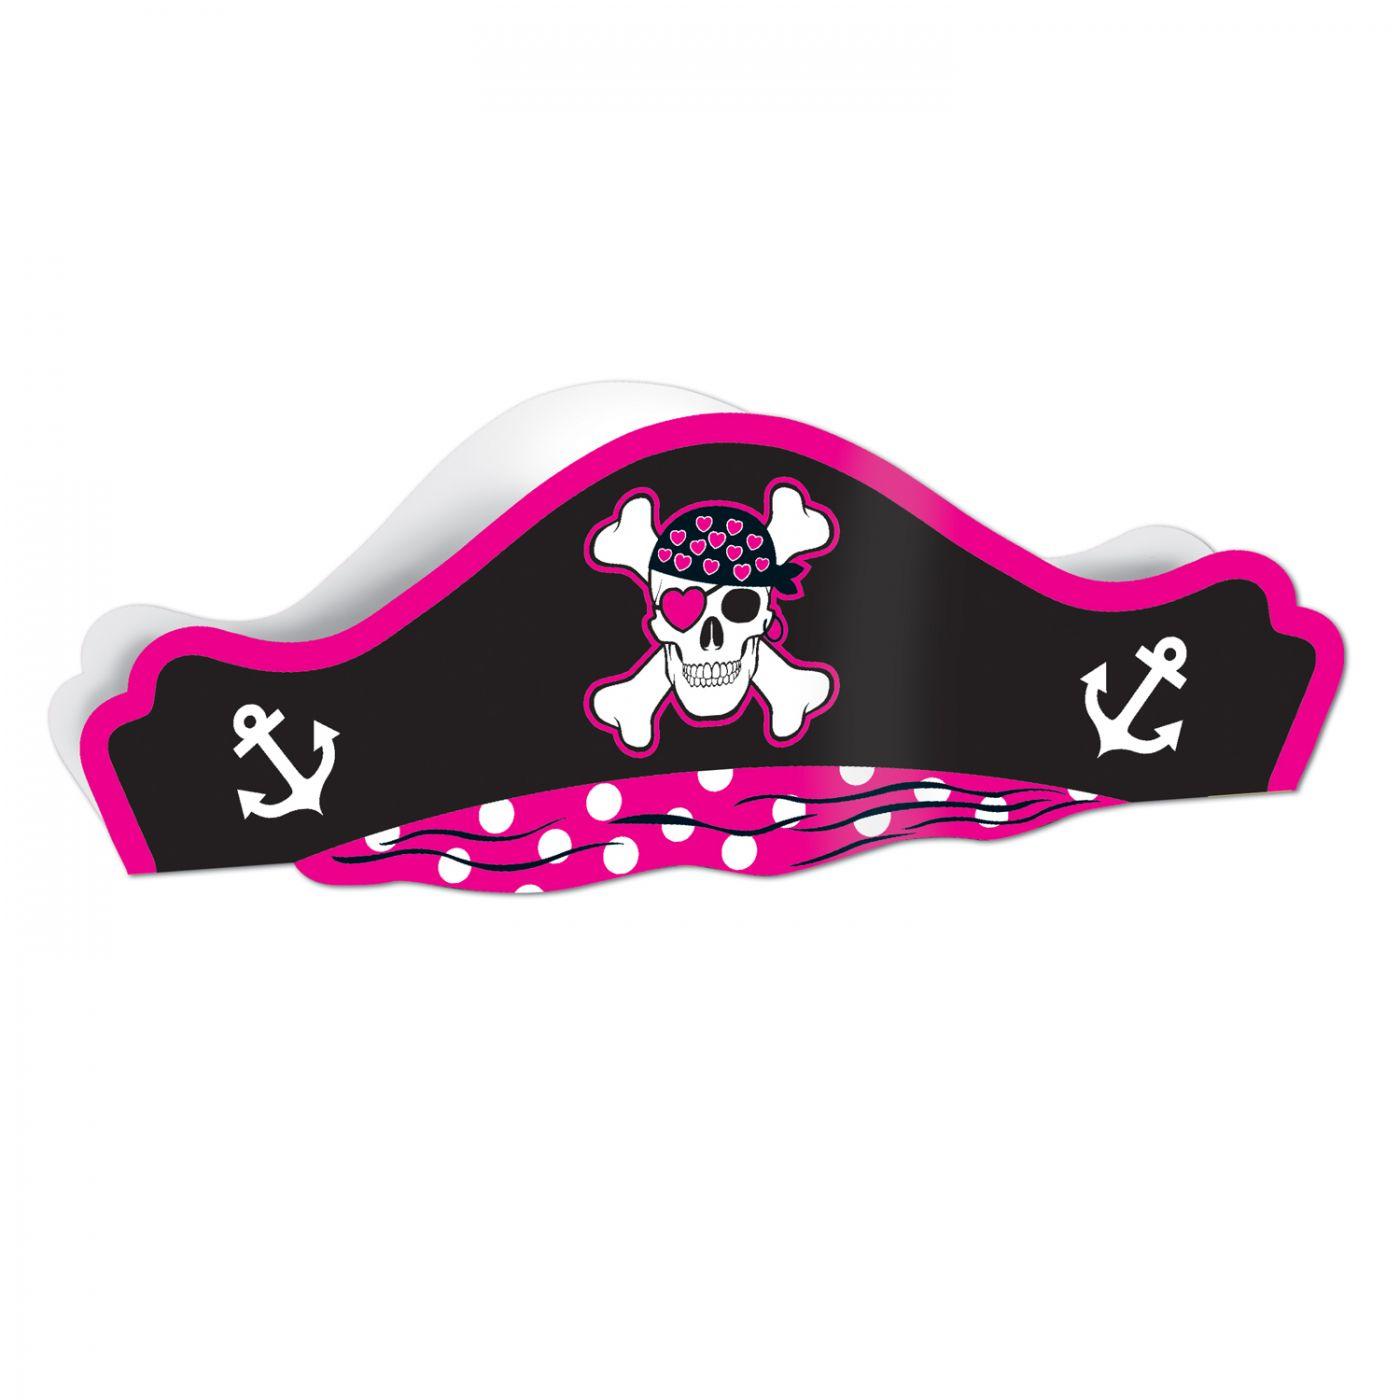 Pink Printed Pirate Hat (48) image